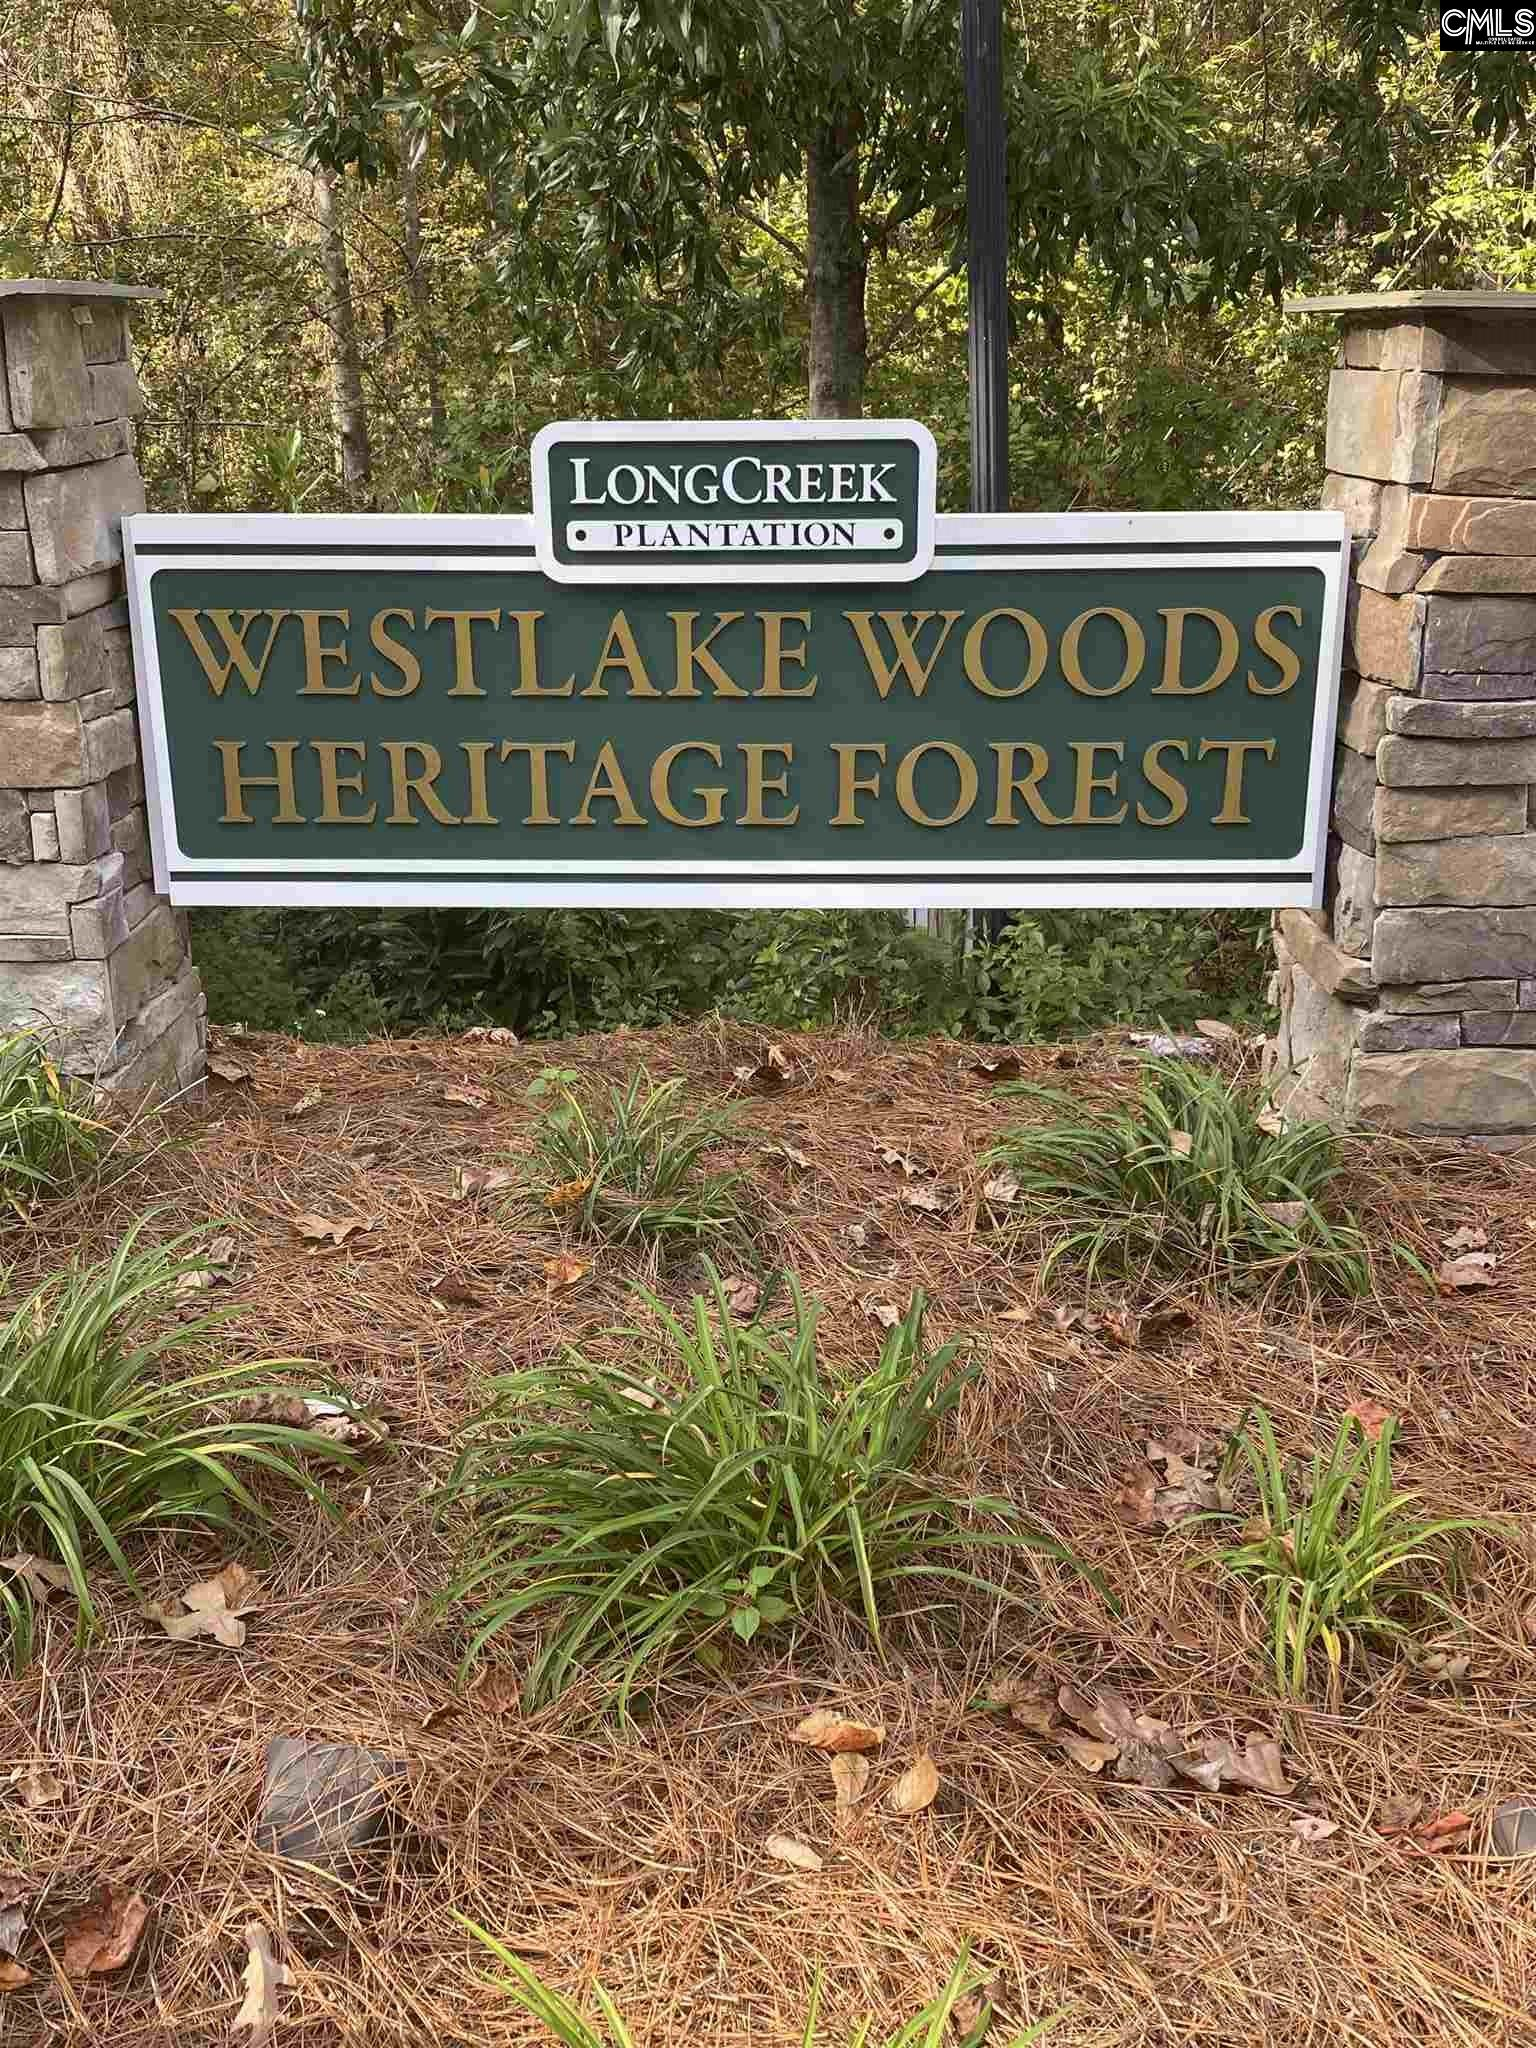 308 Longcreek Plantation Dr Blythewood, SC 29016